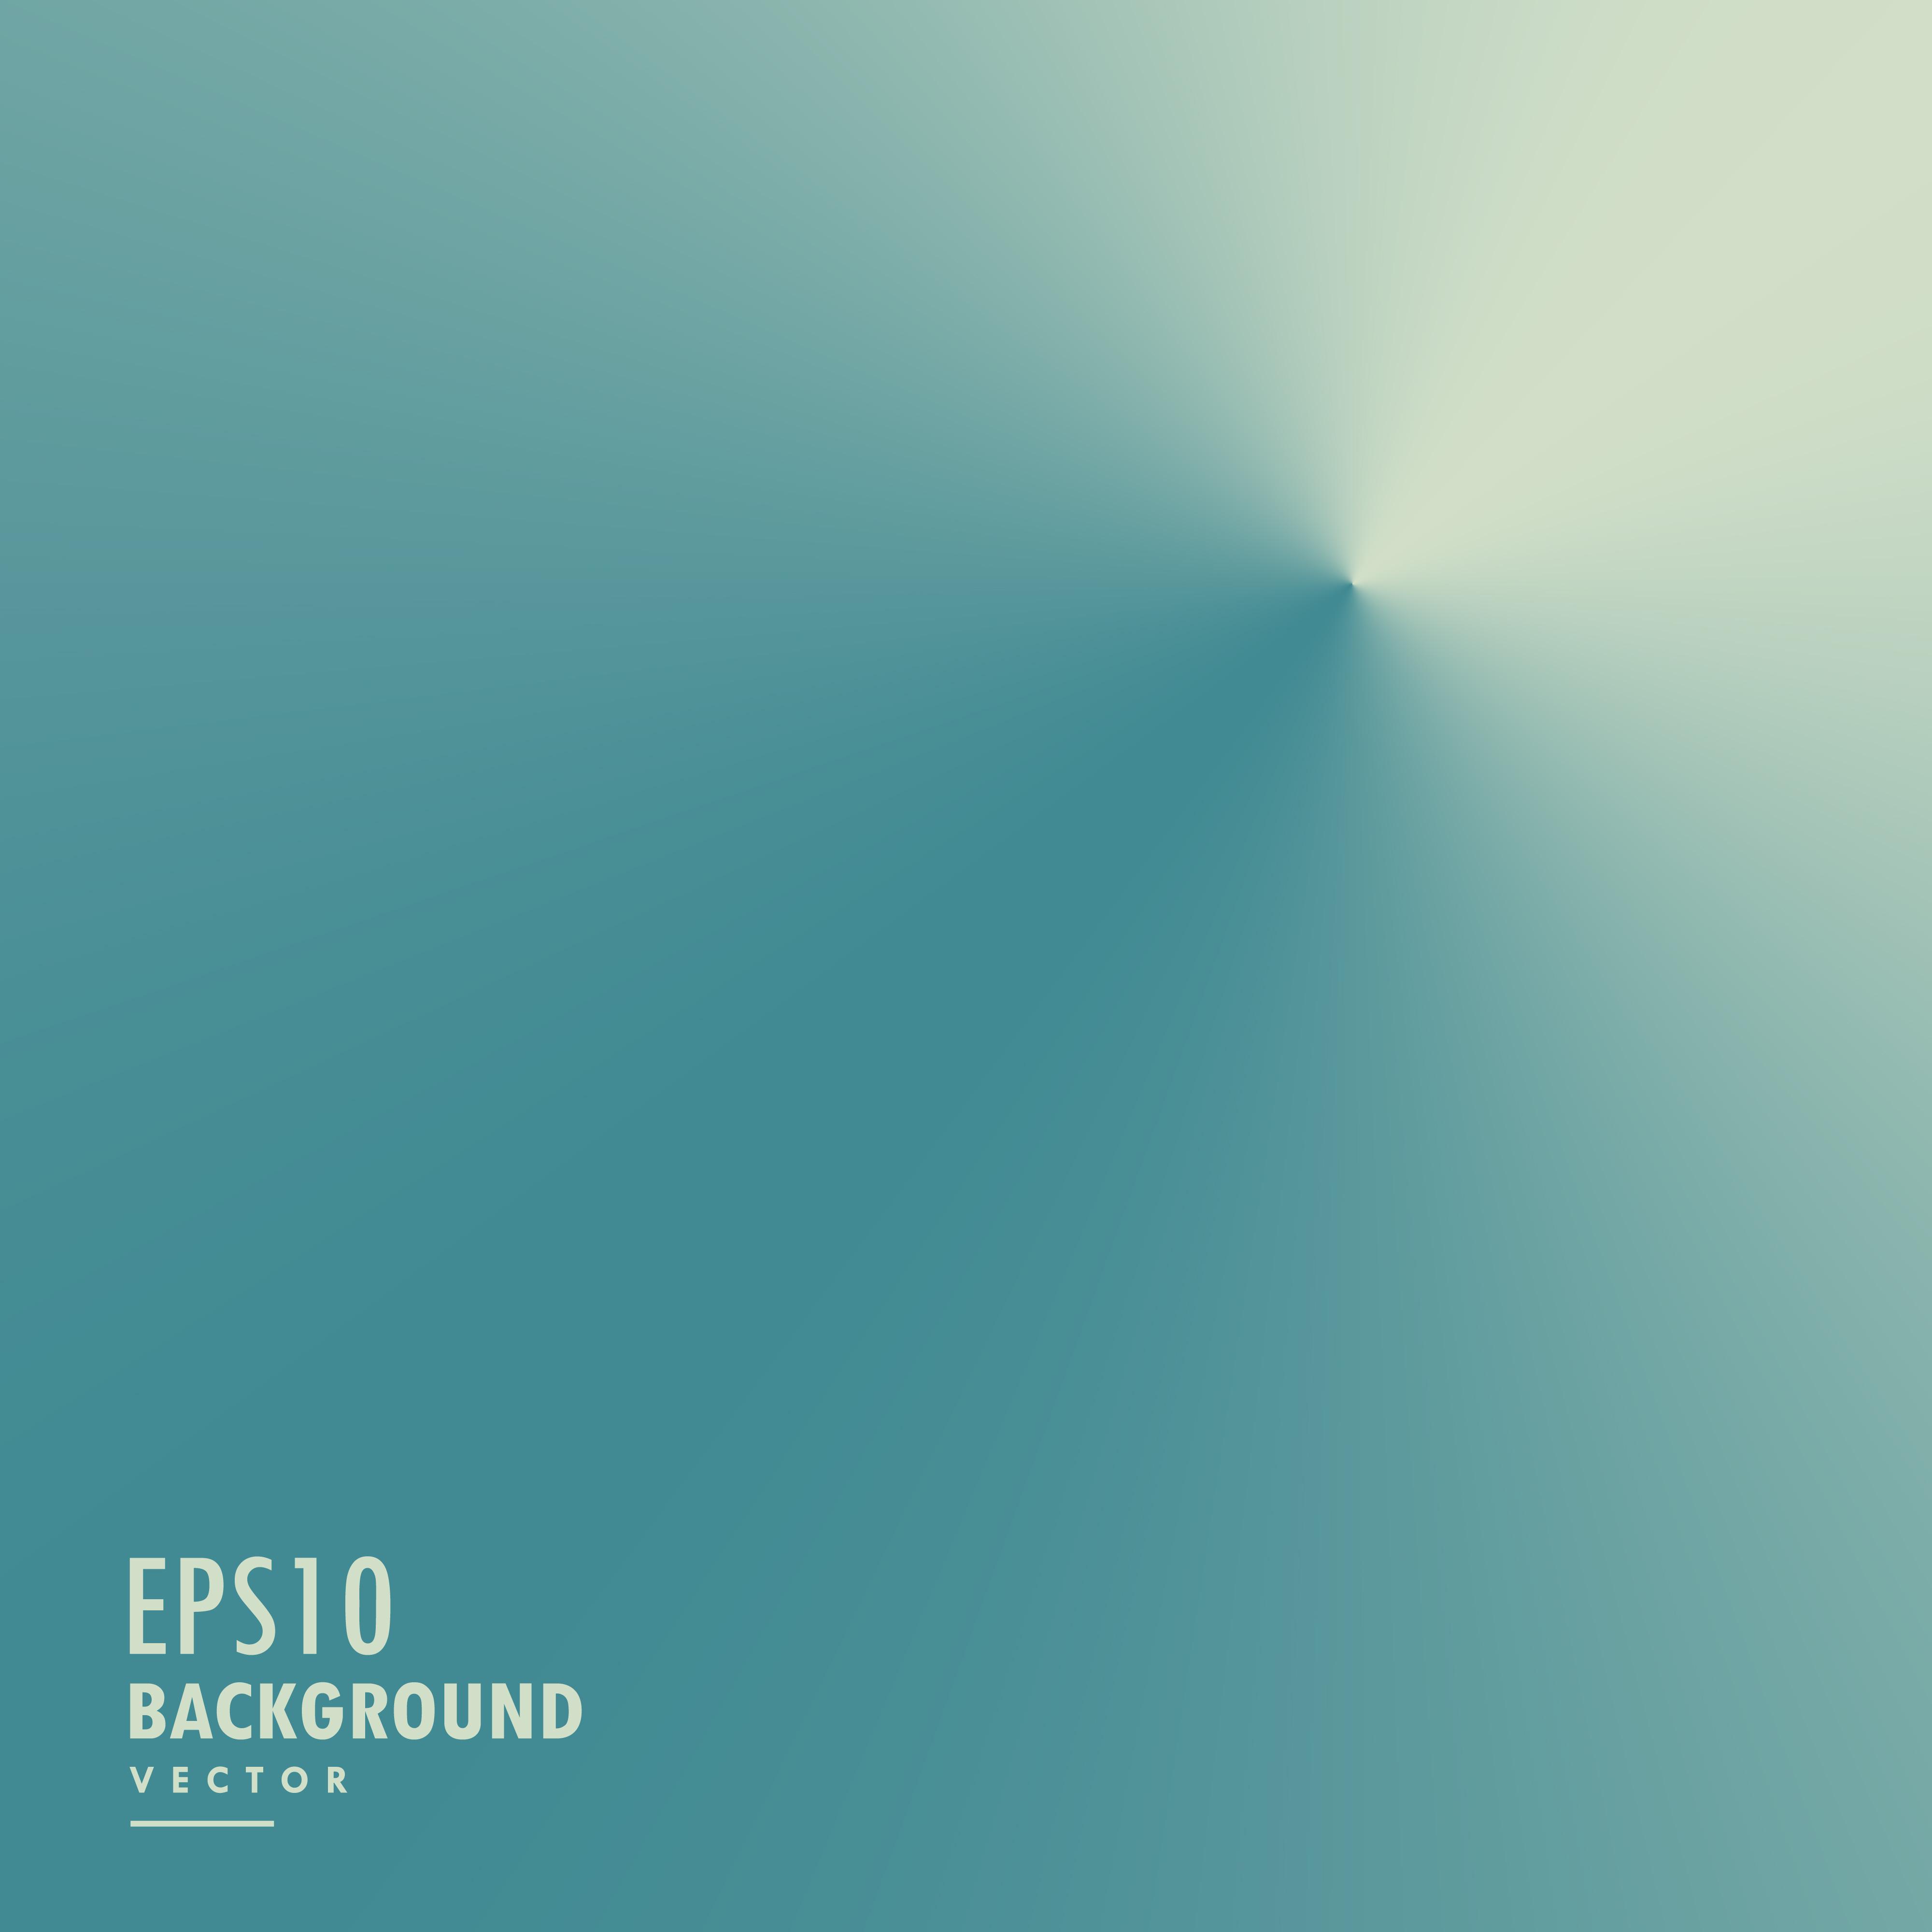 blue gradient free vector art   7833 free downloads